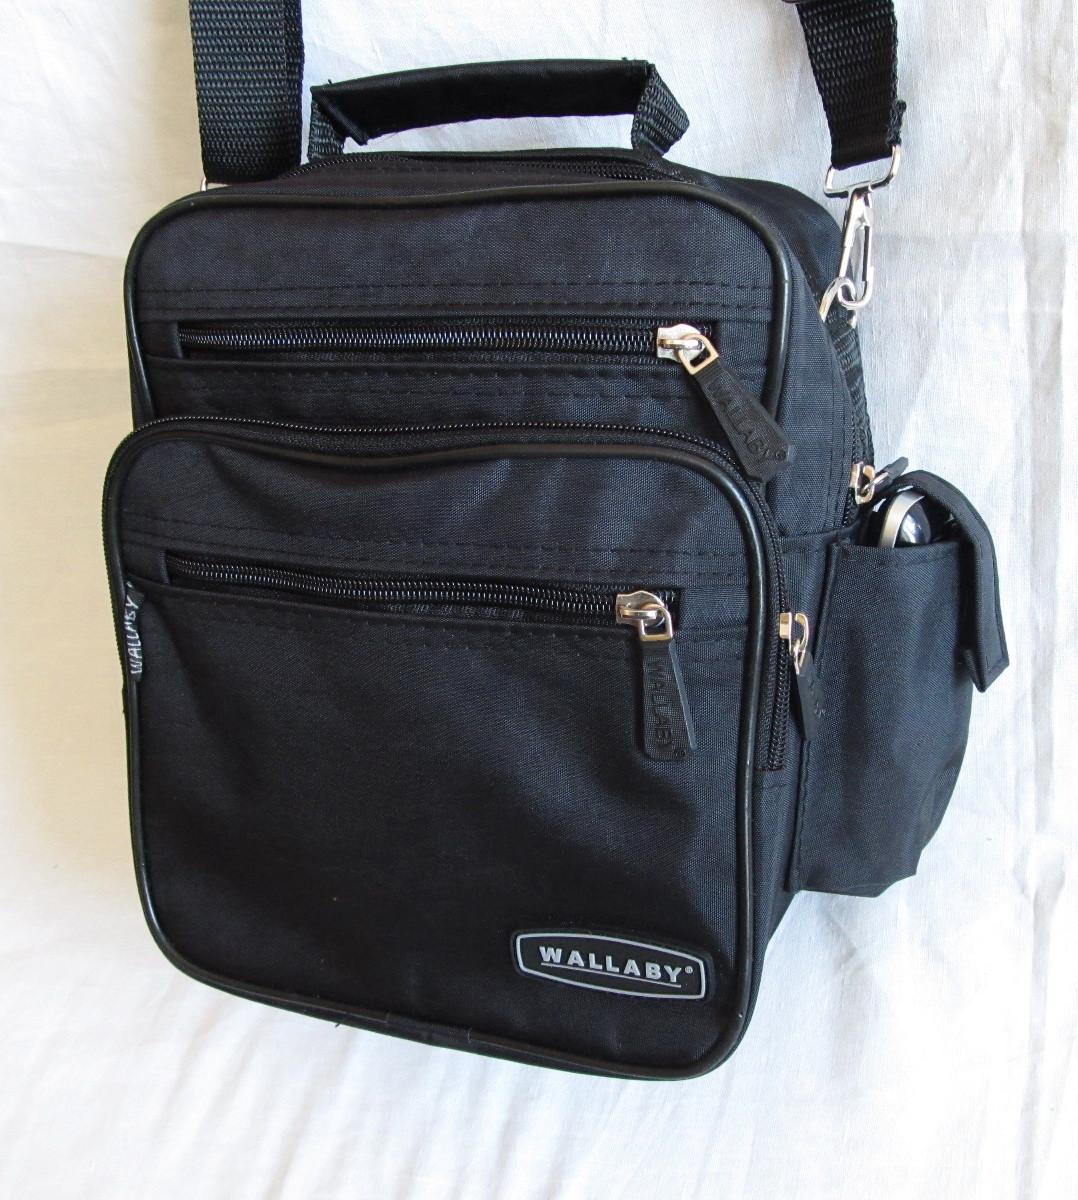 f33e50009bbf Мужская сумка Wallaby2665 черная барсетка через плечо 20х25х16см -  Интернет-магазин